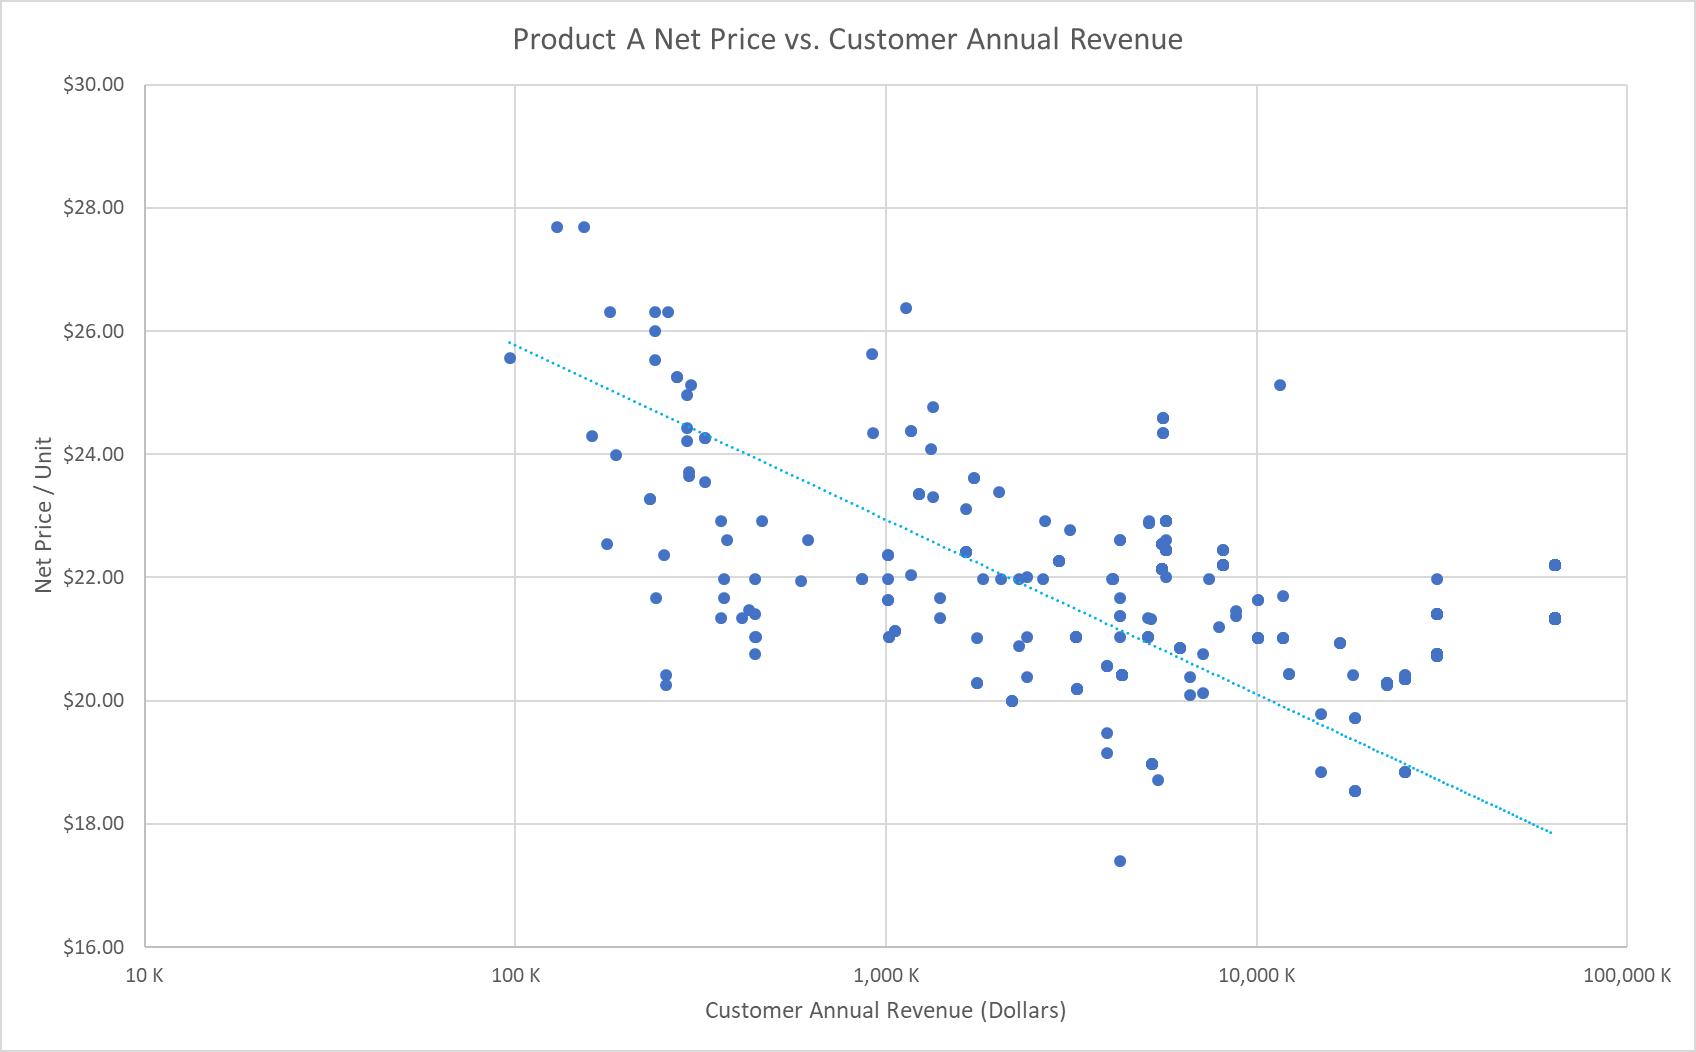 Pricing Analytics: Net Price vs. Customer Annual Revenue